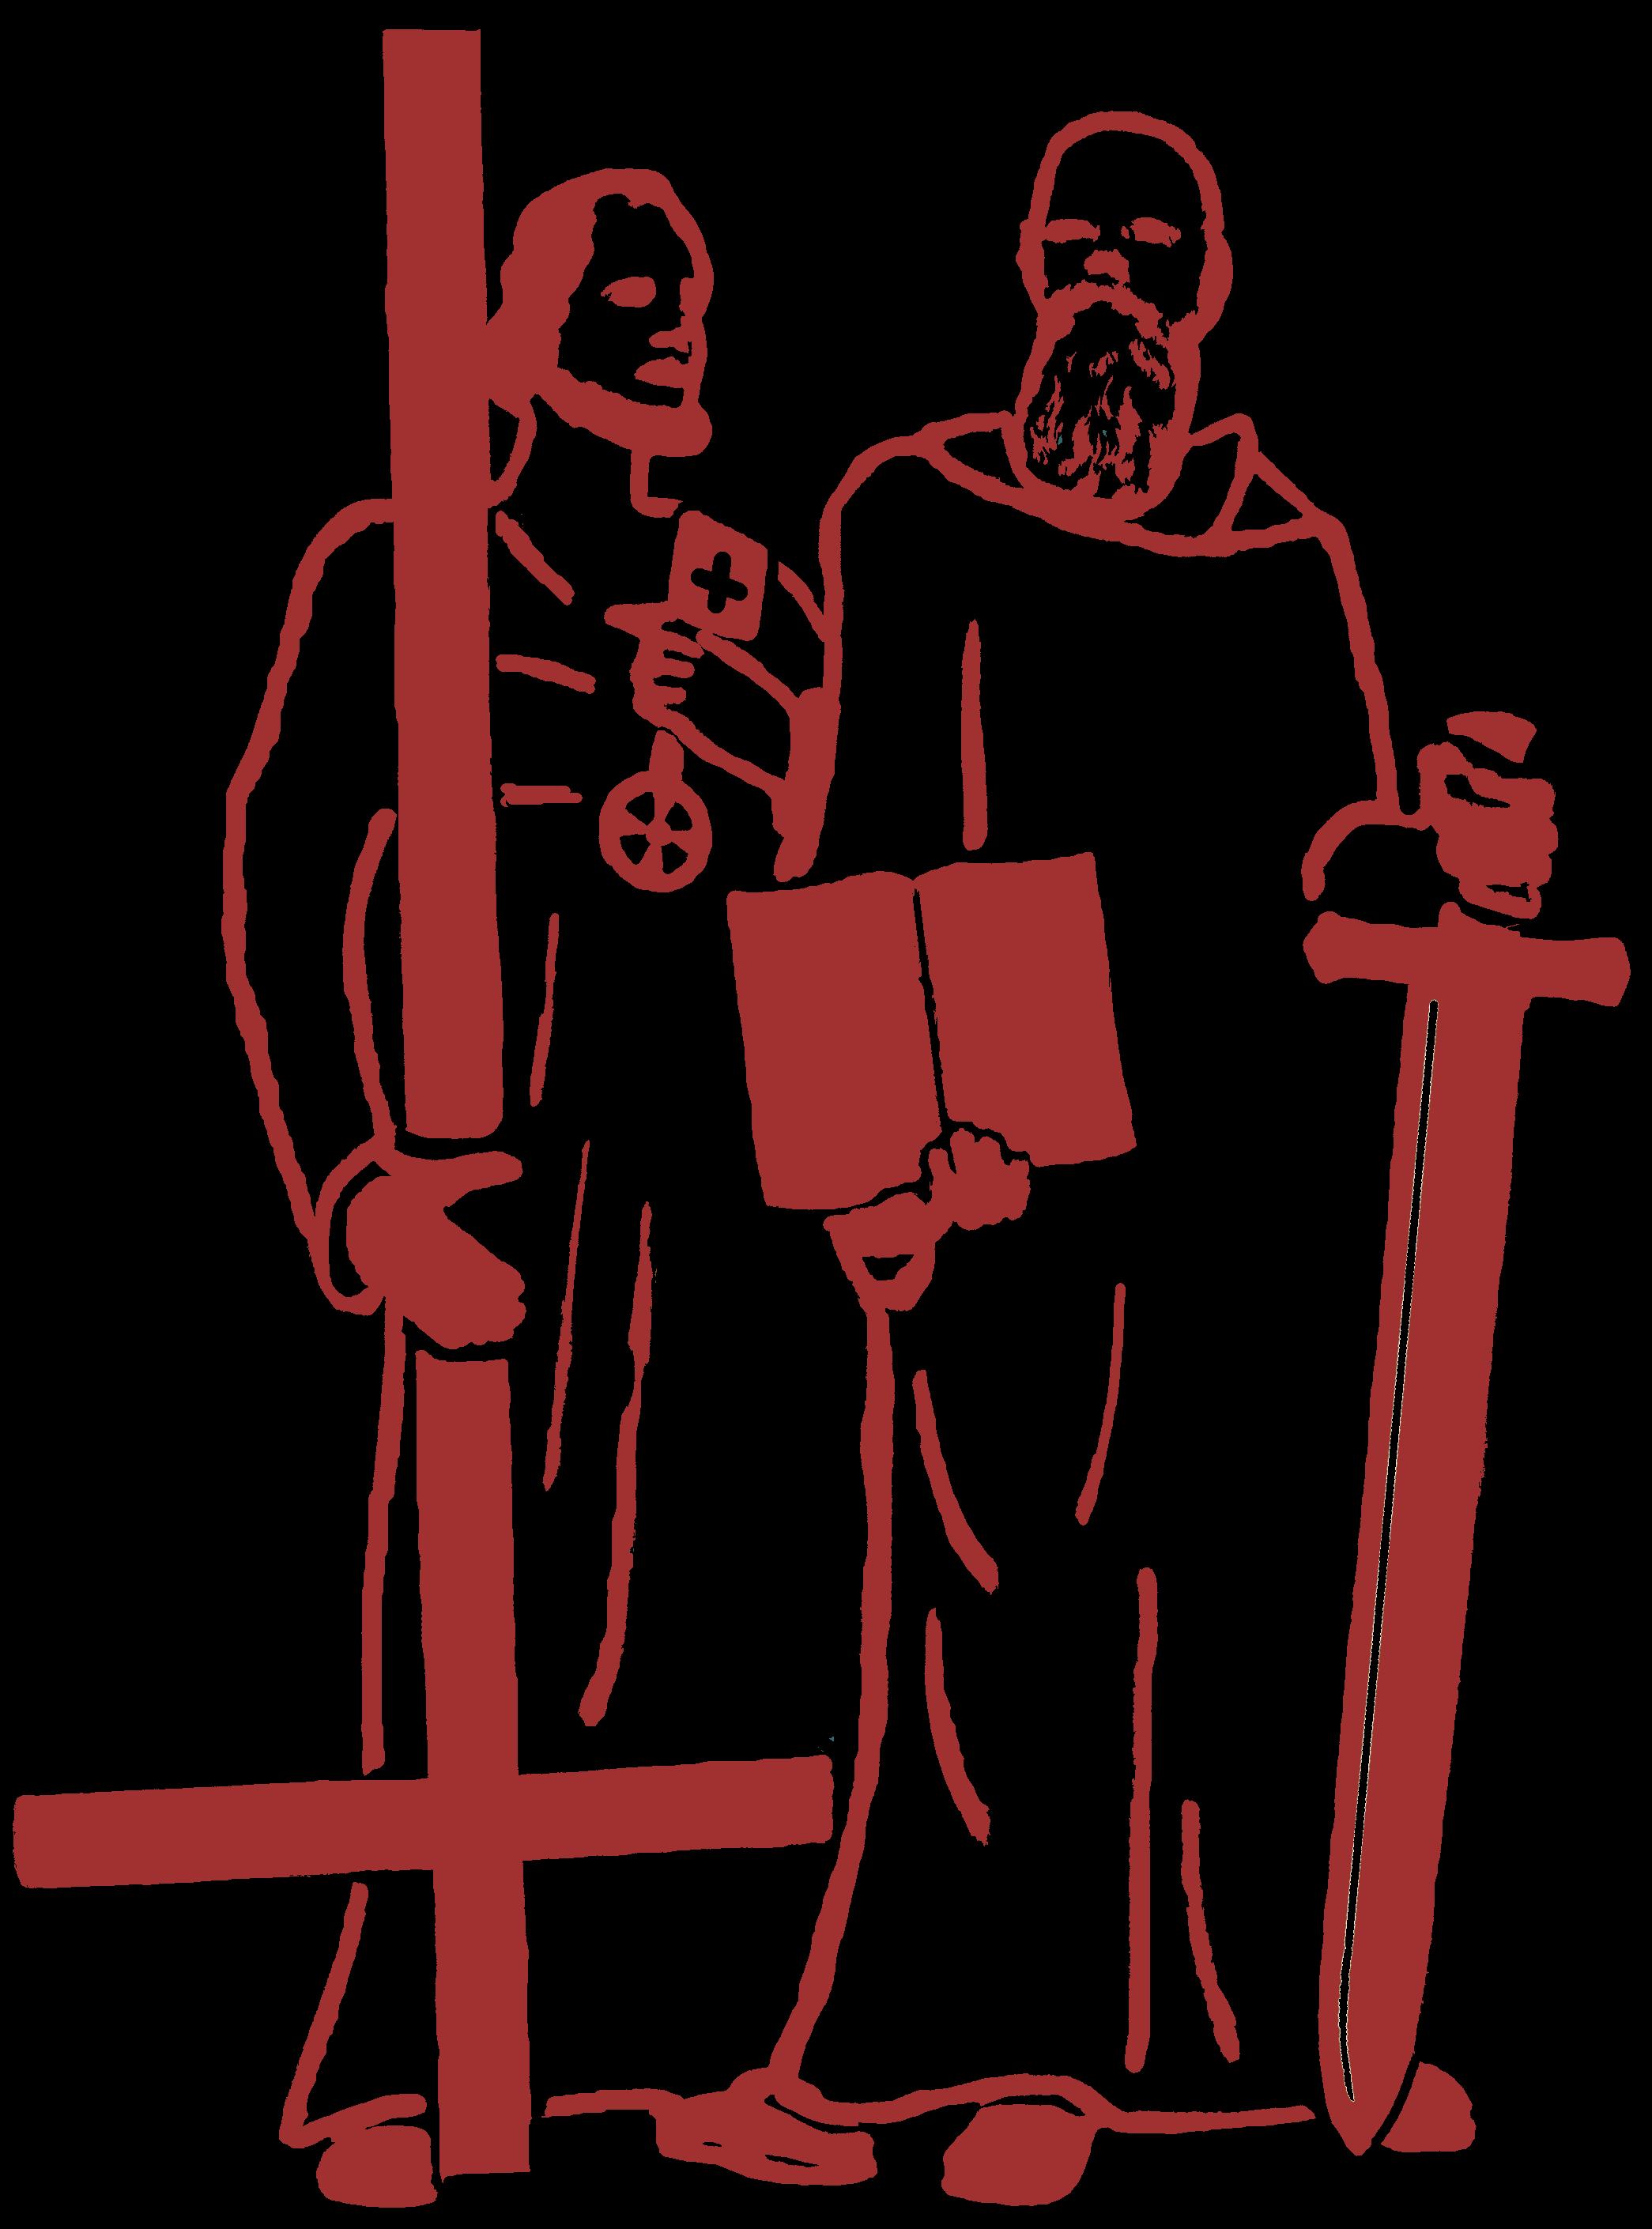 Katholische Pfarrgemeinde Senftenberg